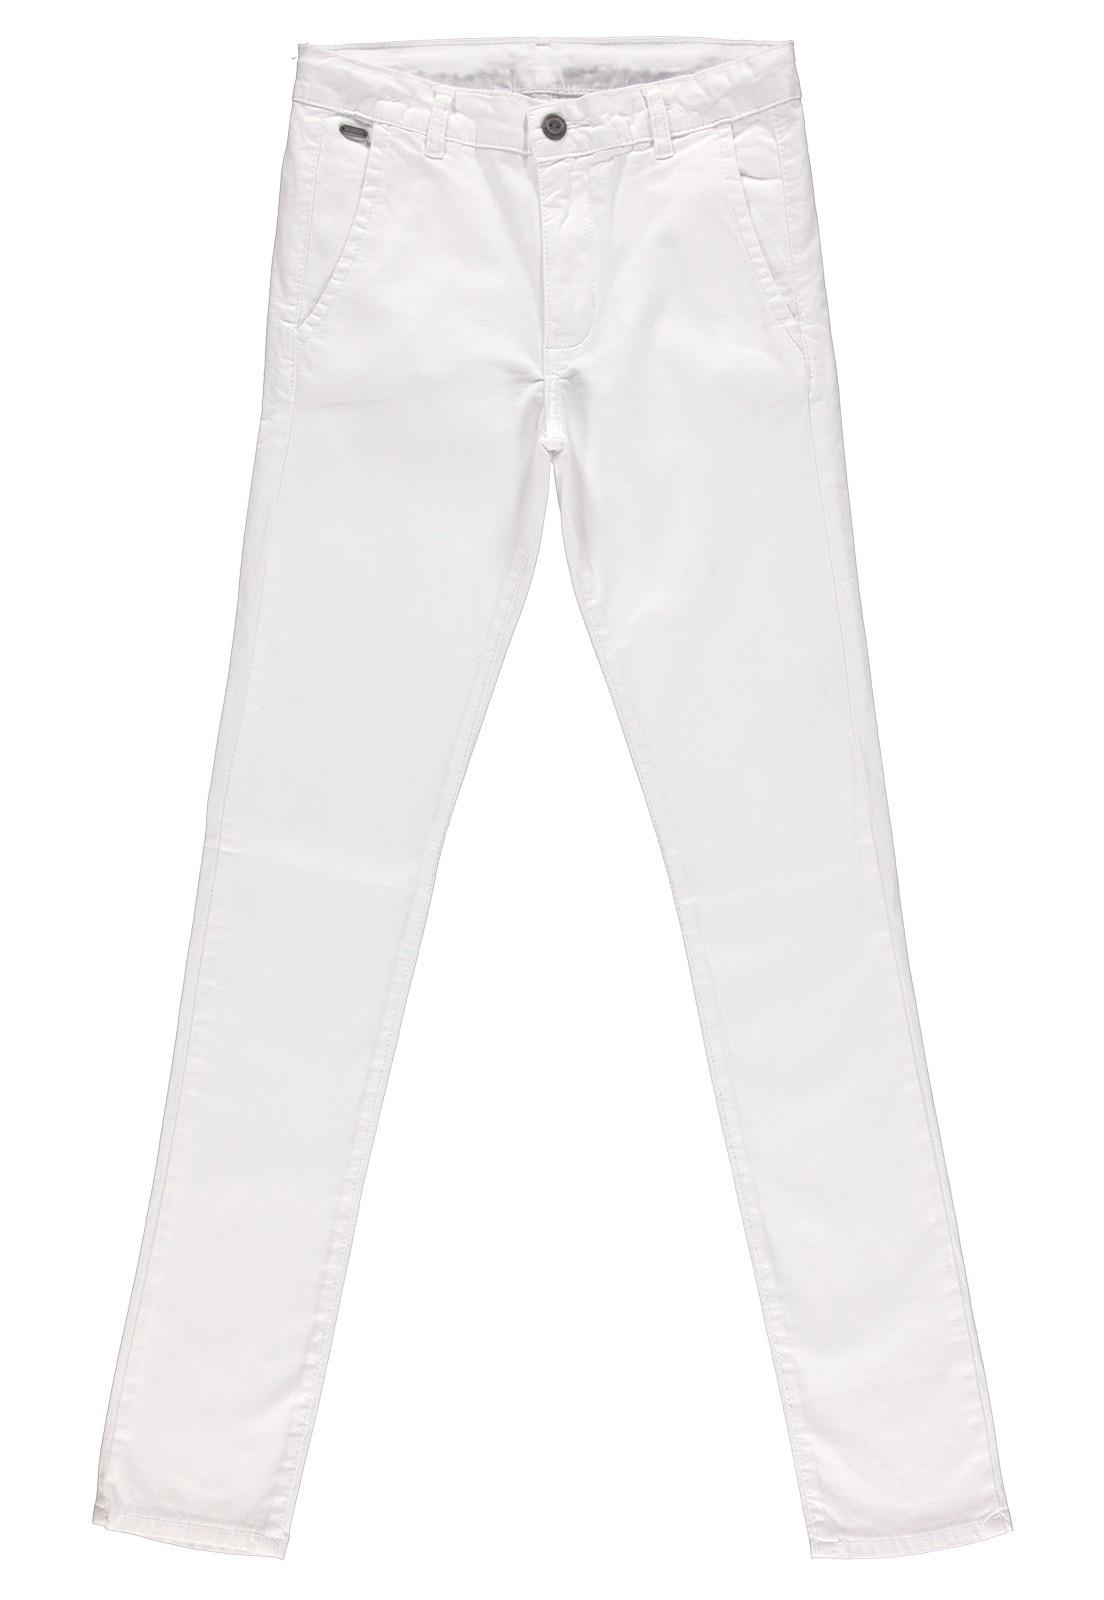 Calça Sarja Masculina Crawling Alfaiataria Branca